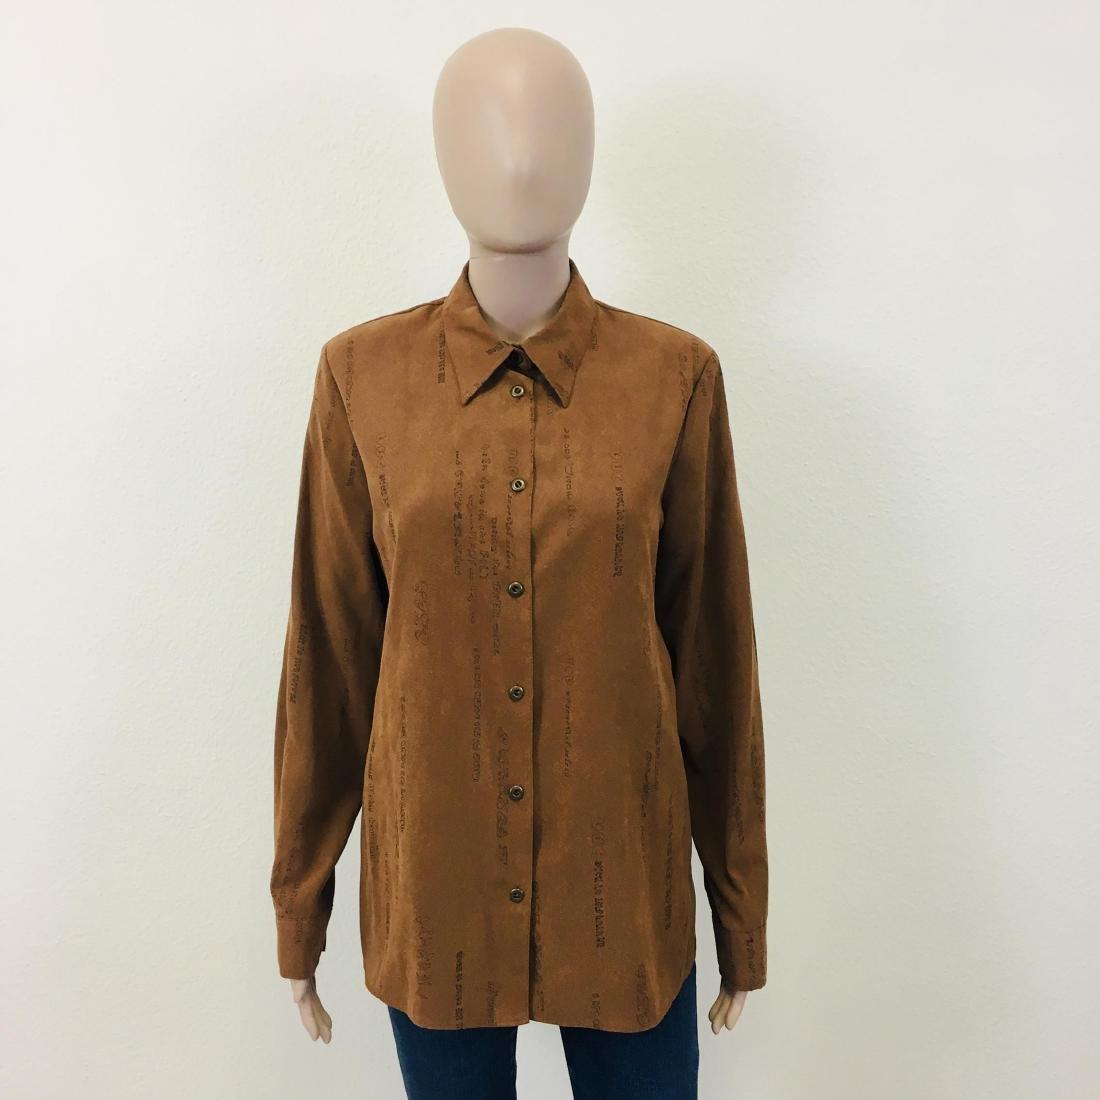 Women's Chicc Shirt Top Blouse